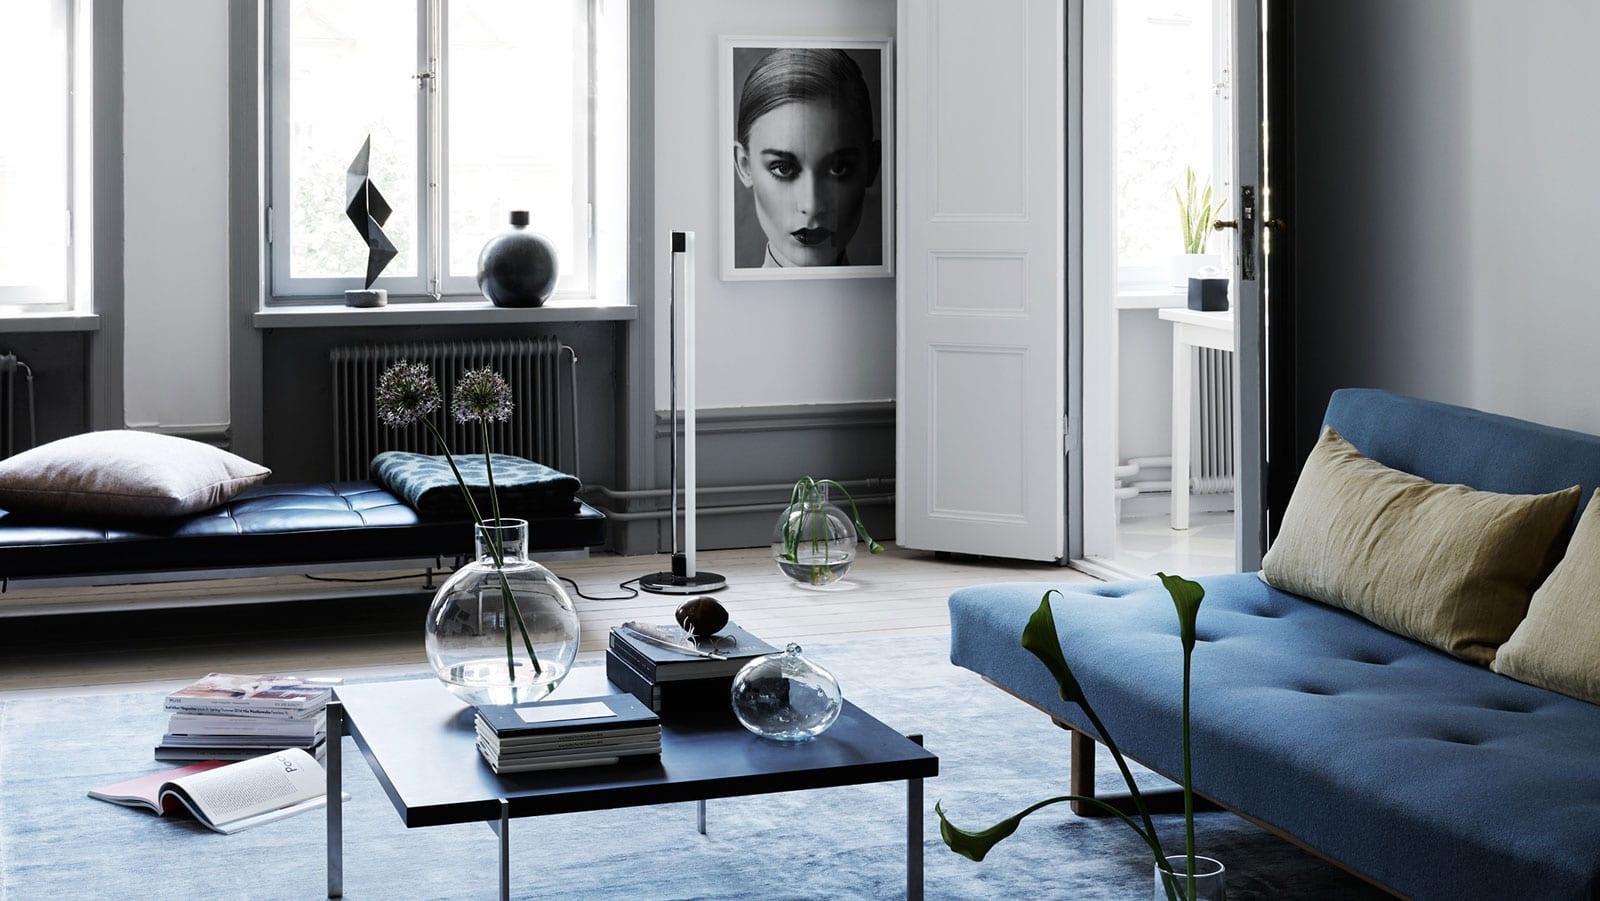 Style&Minimalism | Interiors | Photographer Kristofer Johnsson & Interior Stylist Saša Antić